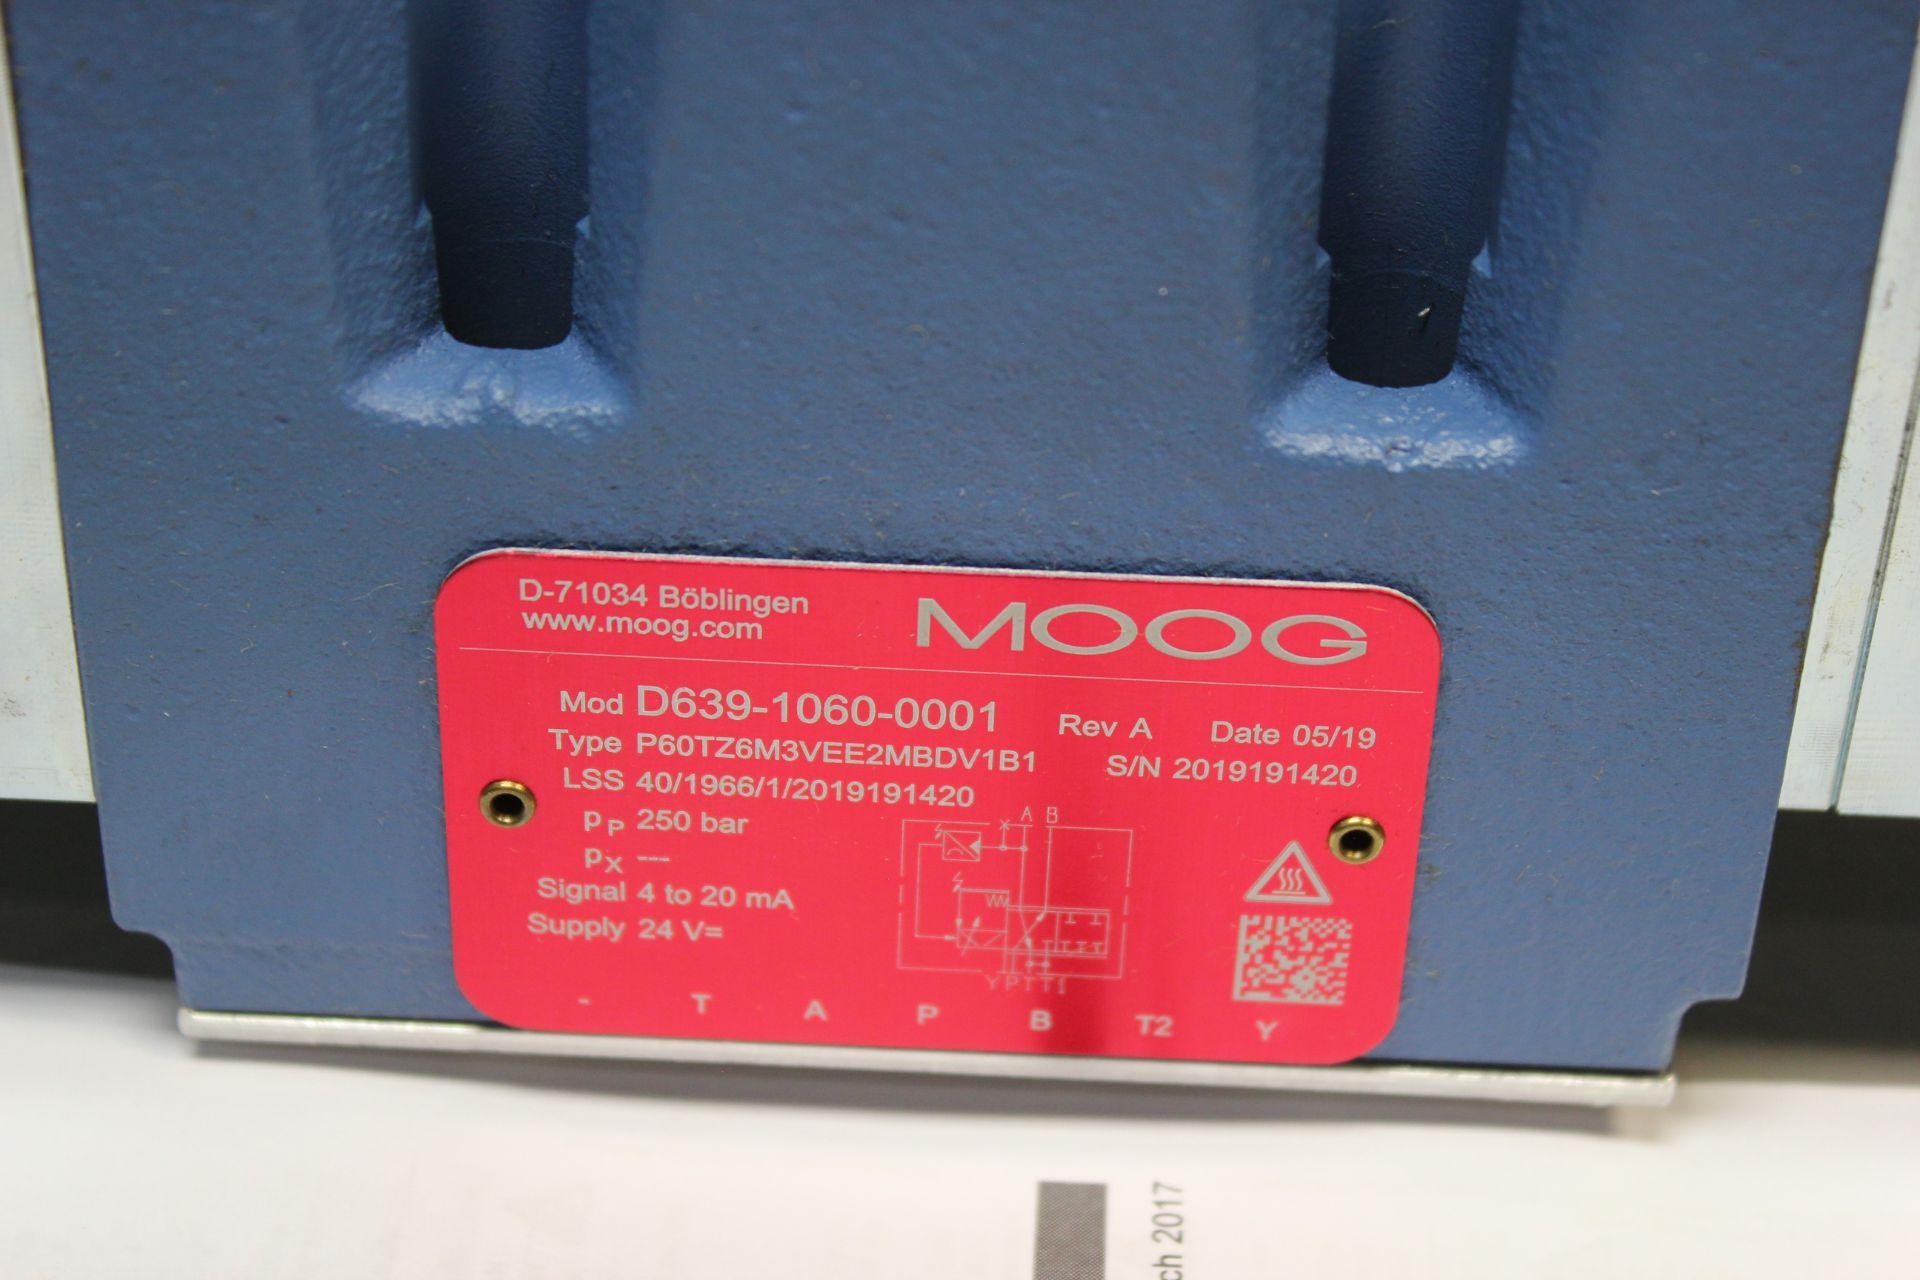 NEW MOOG DIRECT DRIVE DIGITAL CONTROL HYDRAULIC SERVO VALVE - Image 5 of 14